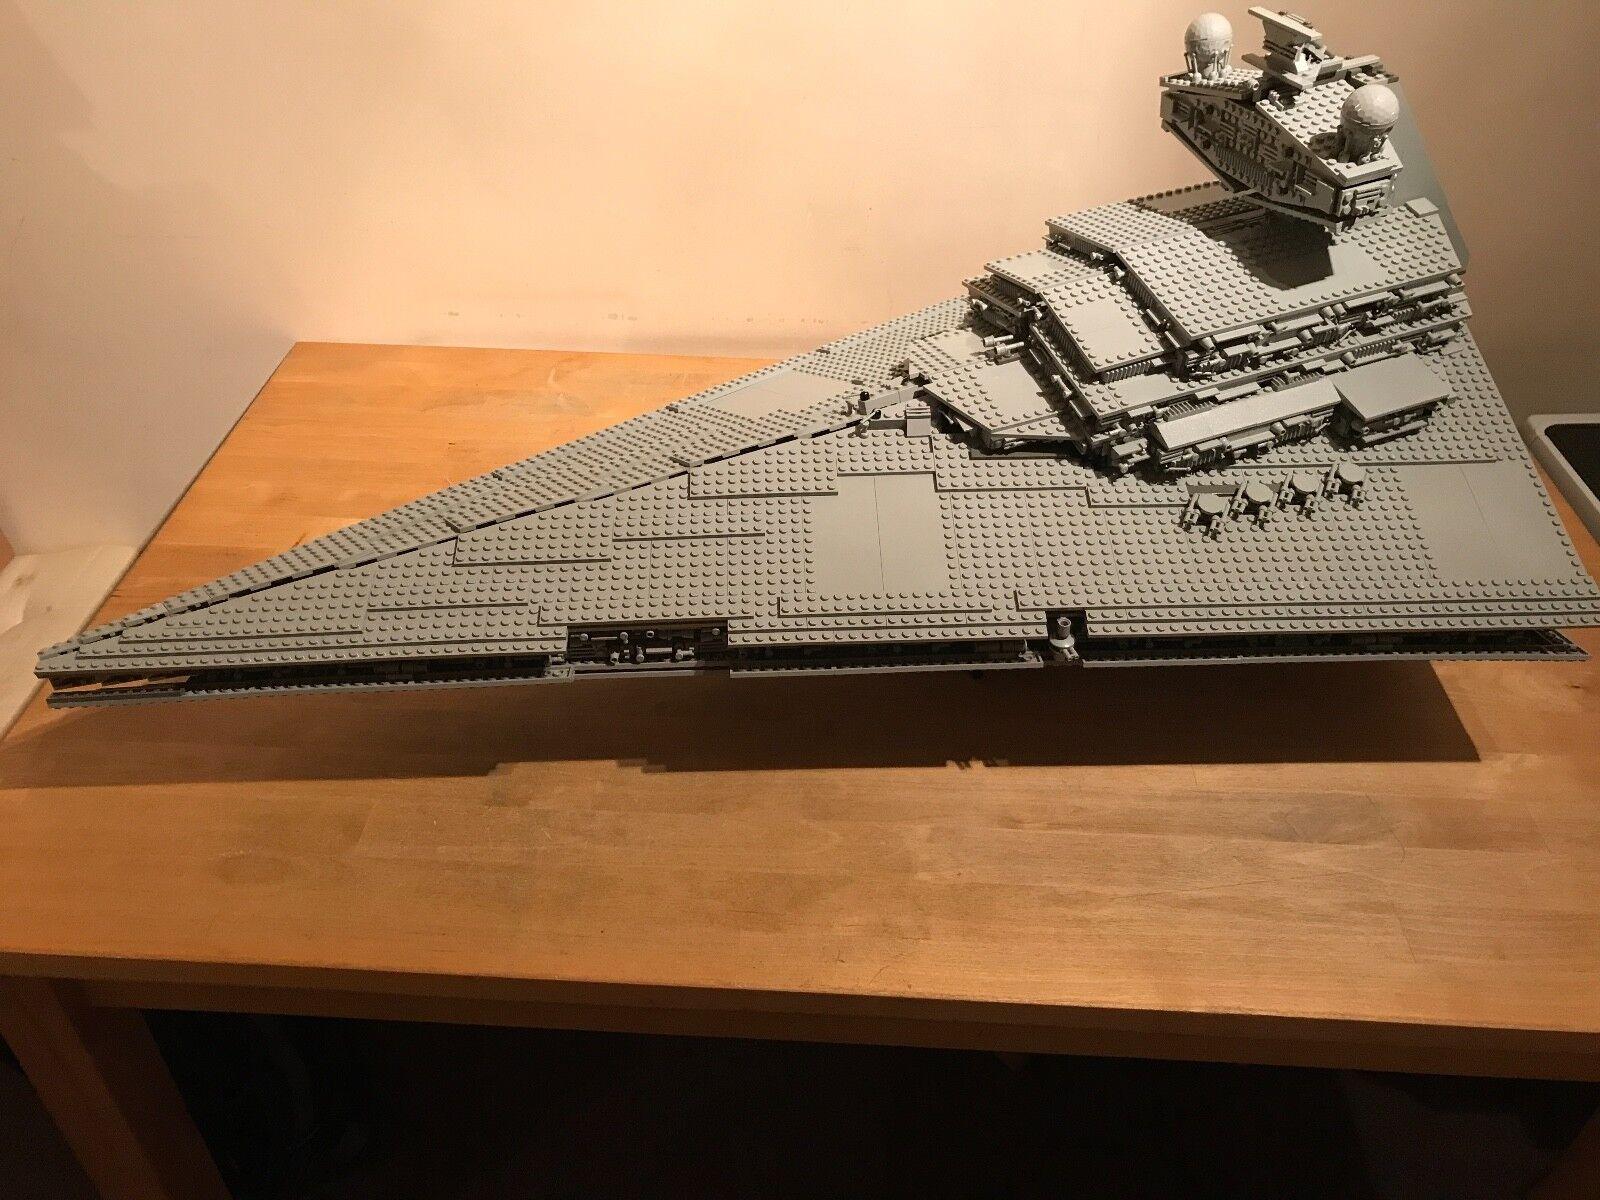 Lego Star Wars 10030-UCS Star Destroyer (boxed)